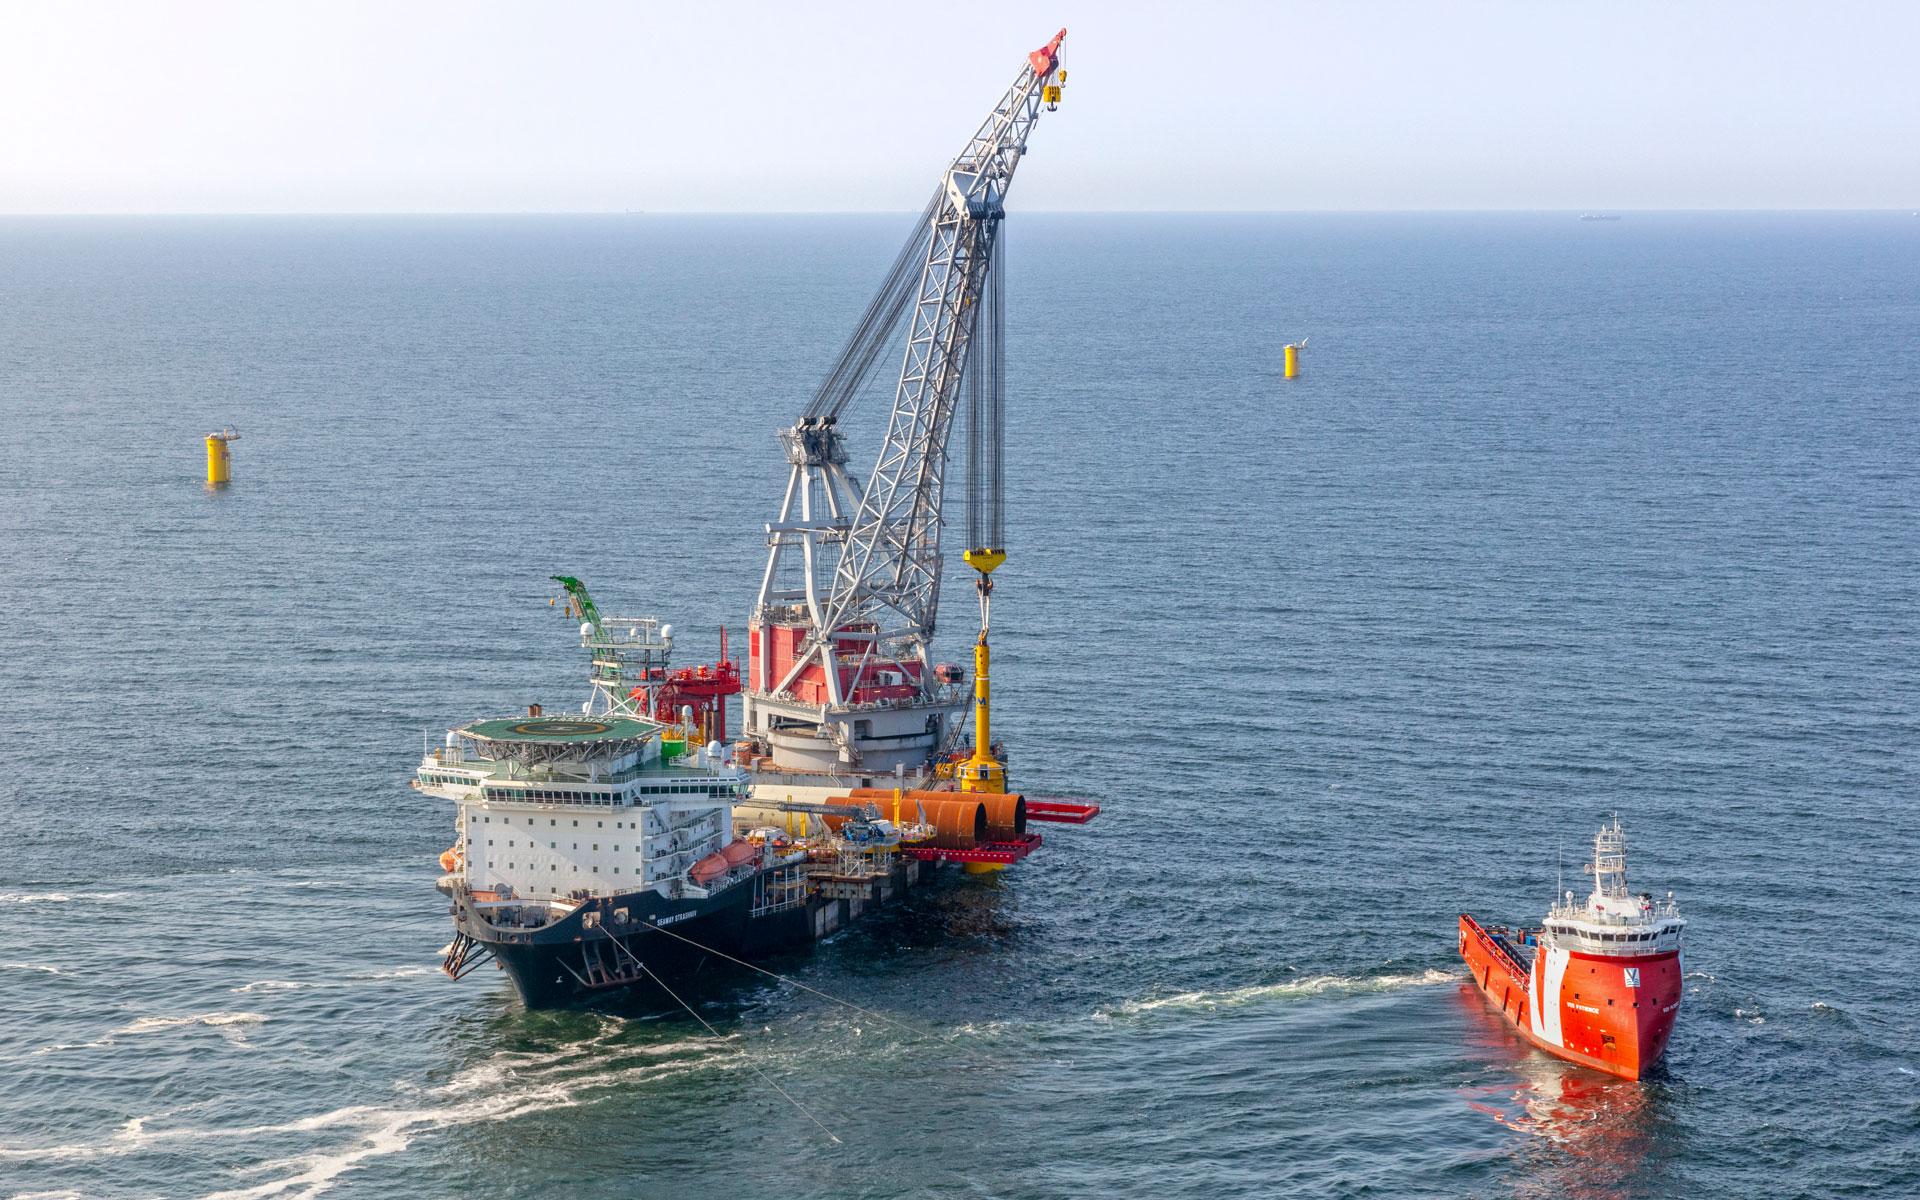 offshore-construction-of-the-Hollandse-Kust-Zuid.jpg